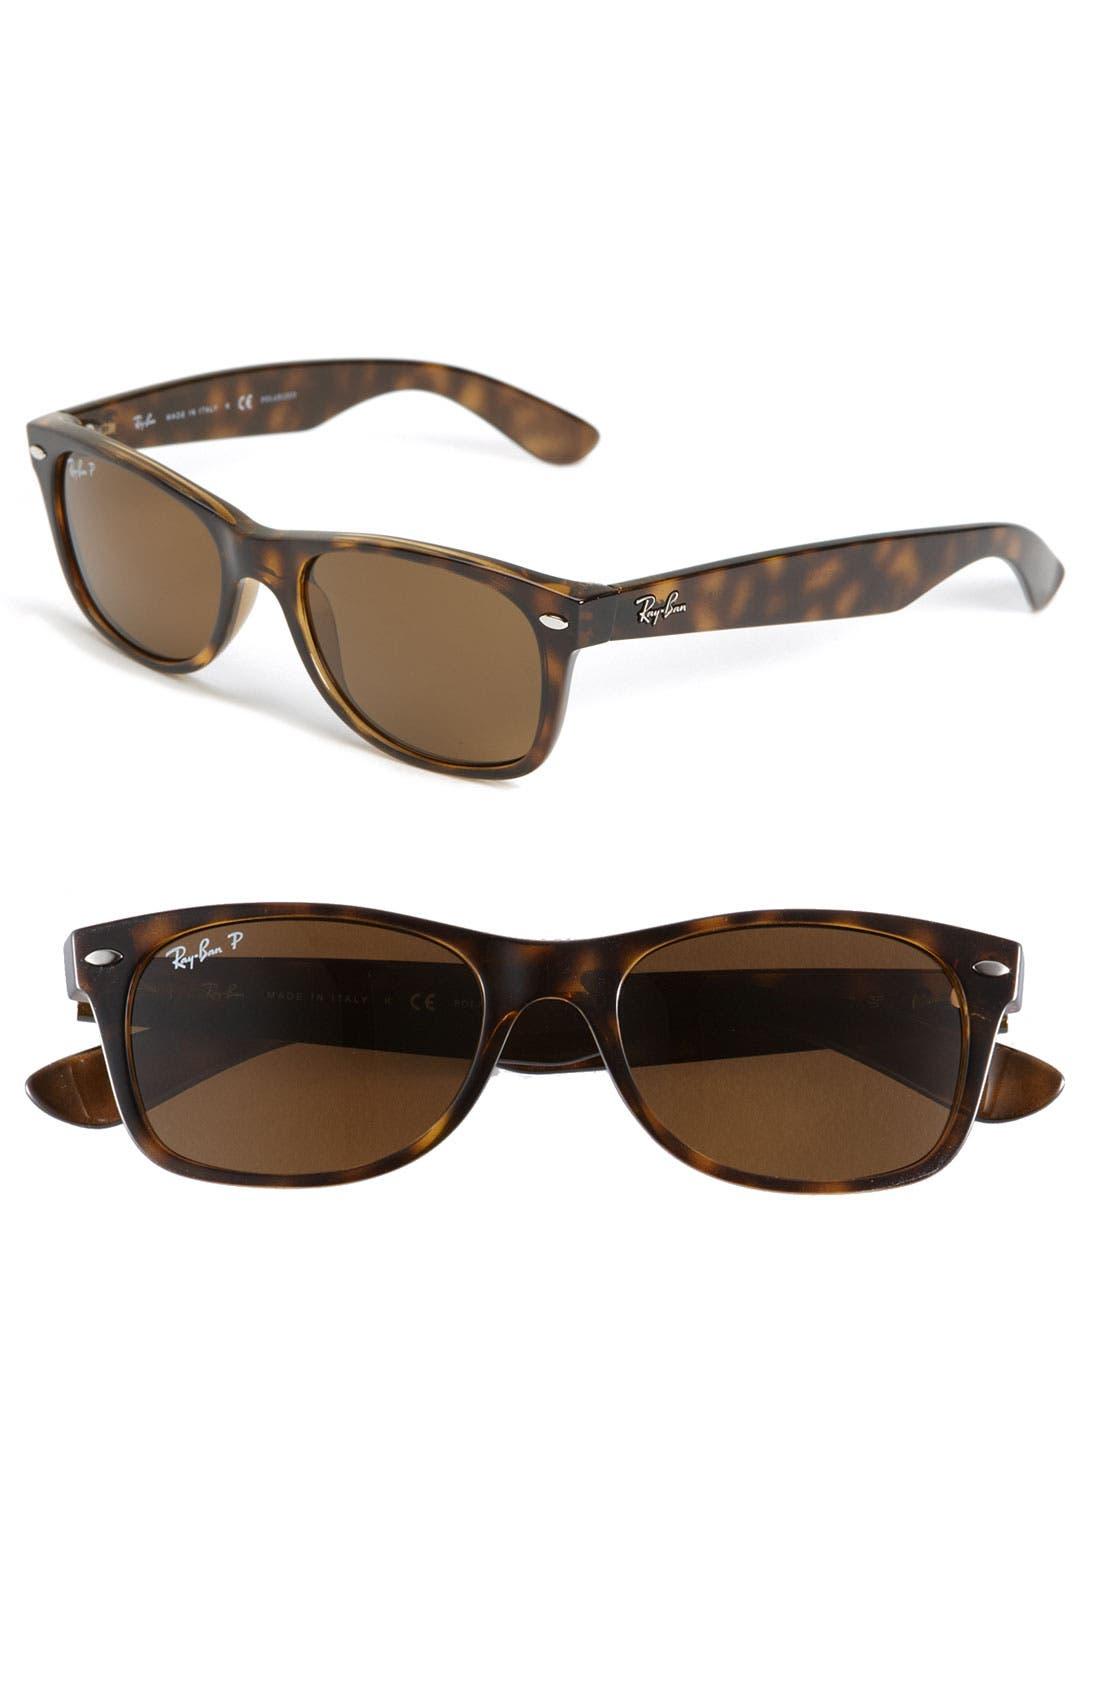 Main Image - Ray-Ban Small New Wayfarer 52mm Polarized Sunglasses